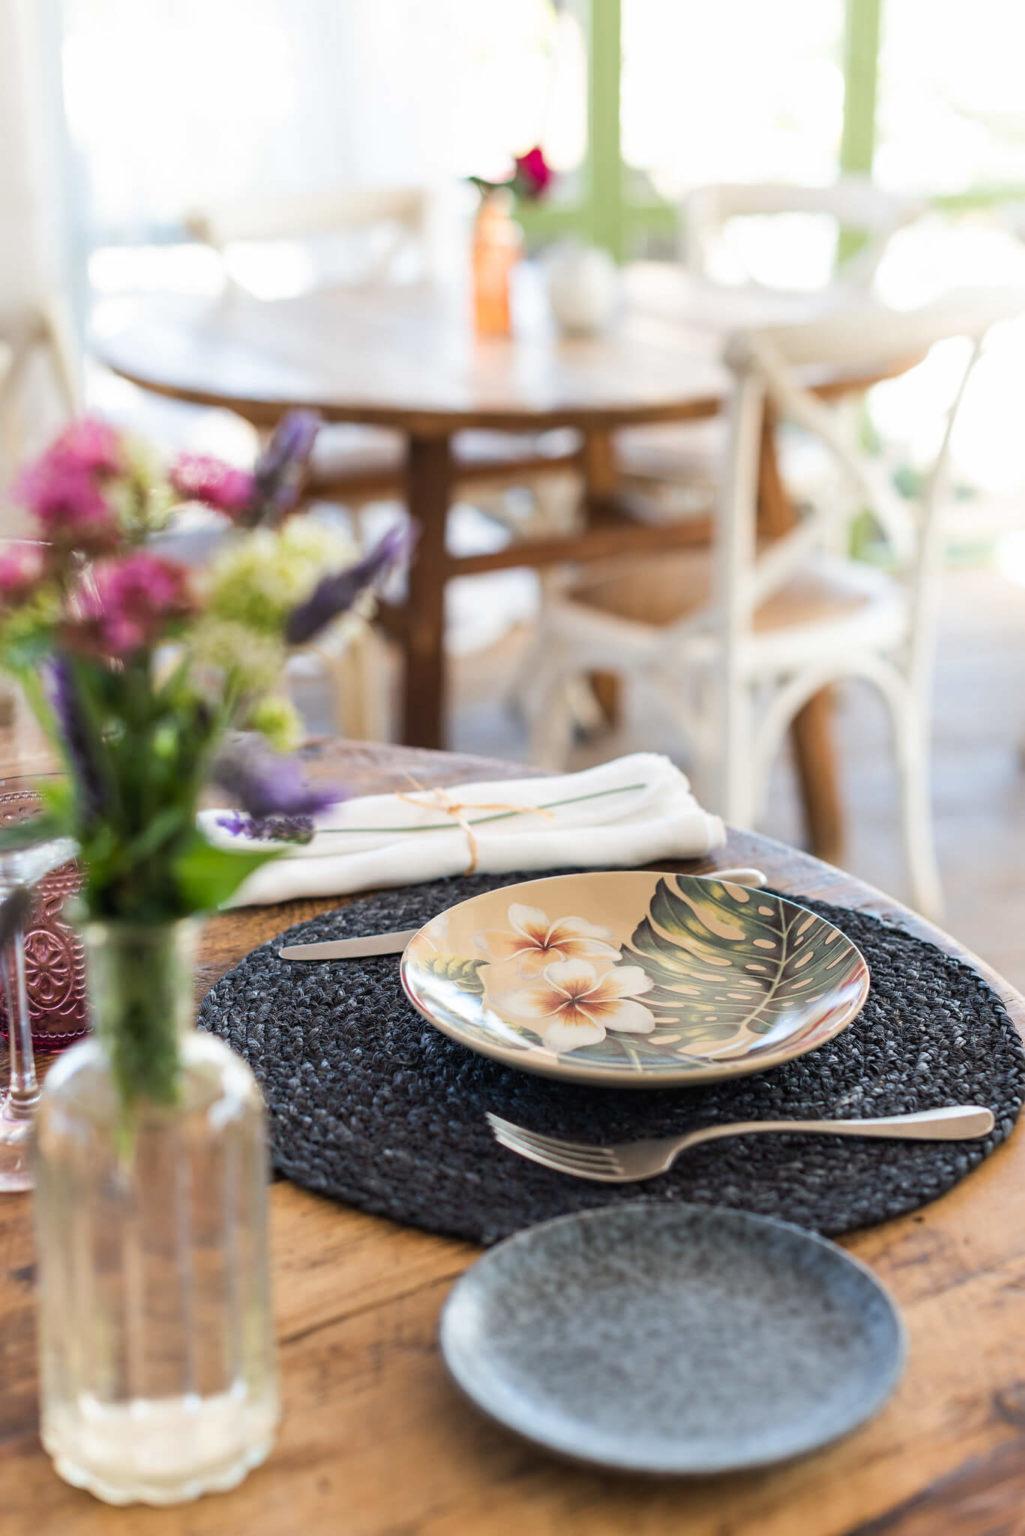 https://www.white-ibiza.com/wp-content/uploads/2020/03/white-ibiza-restaurants-es-cucons-04-1025x1536.jpg